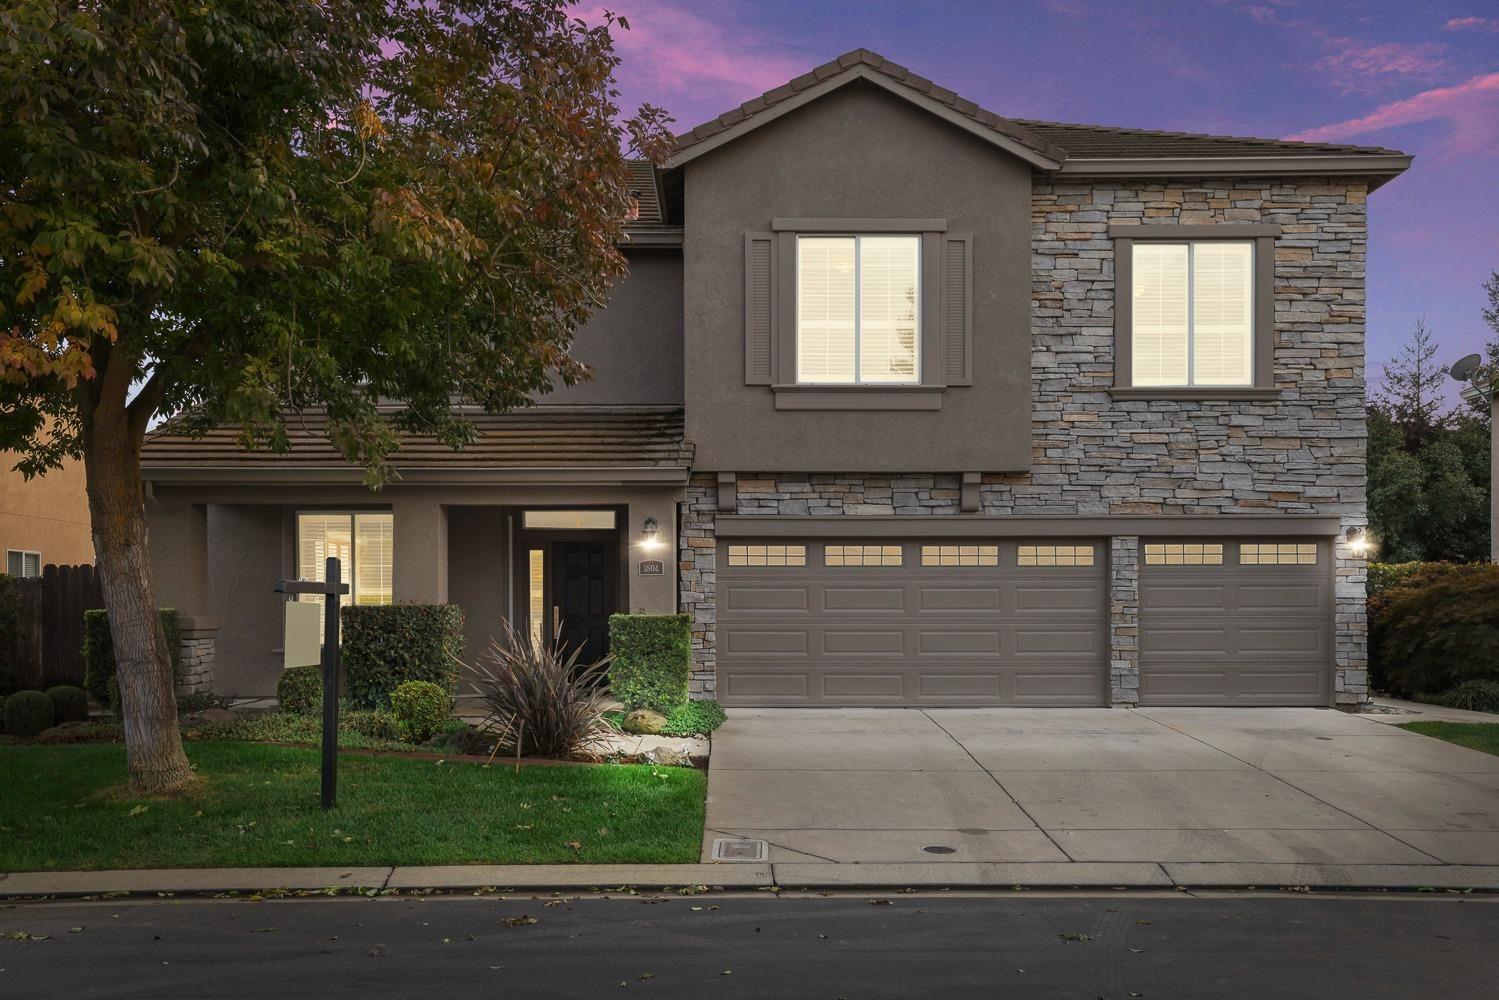 Photo of 1804 St Mayeul Drive, Modesto, CA 95356 (MLS # 221133676)